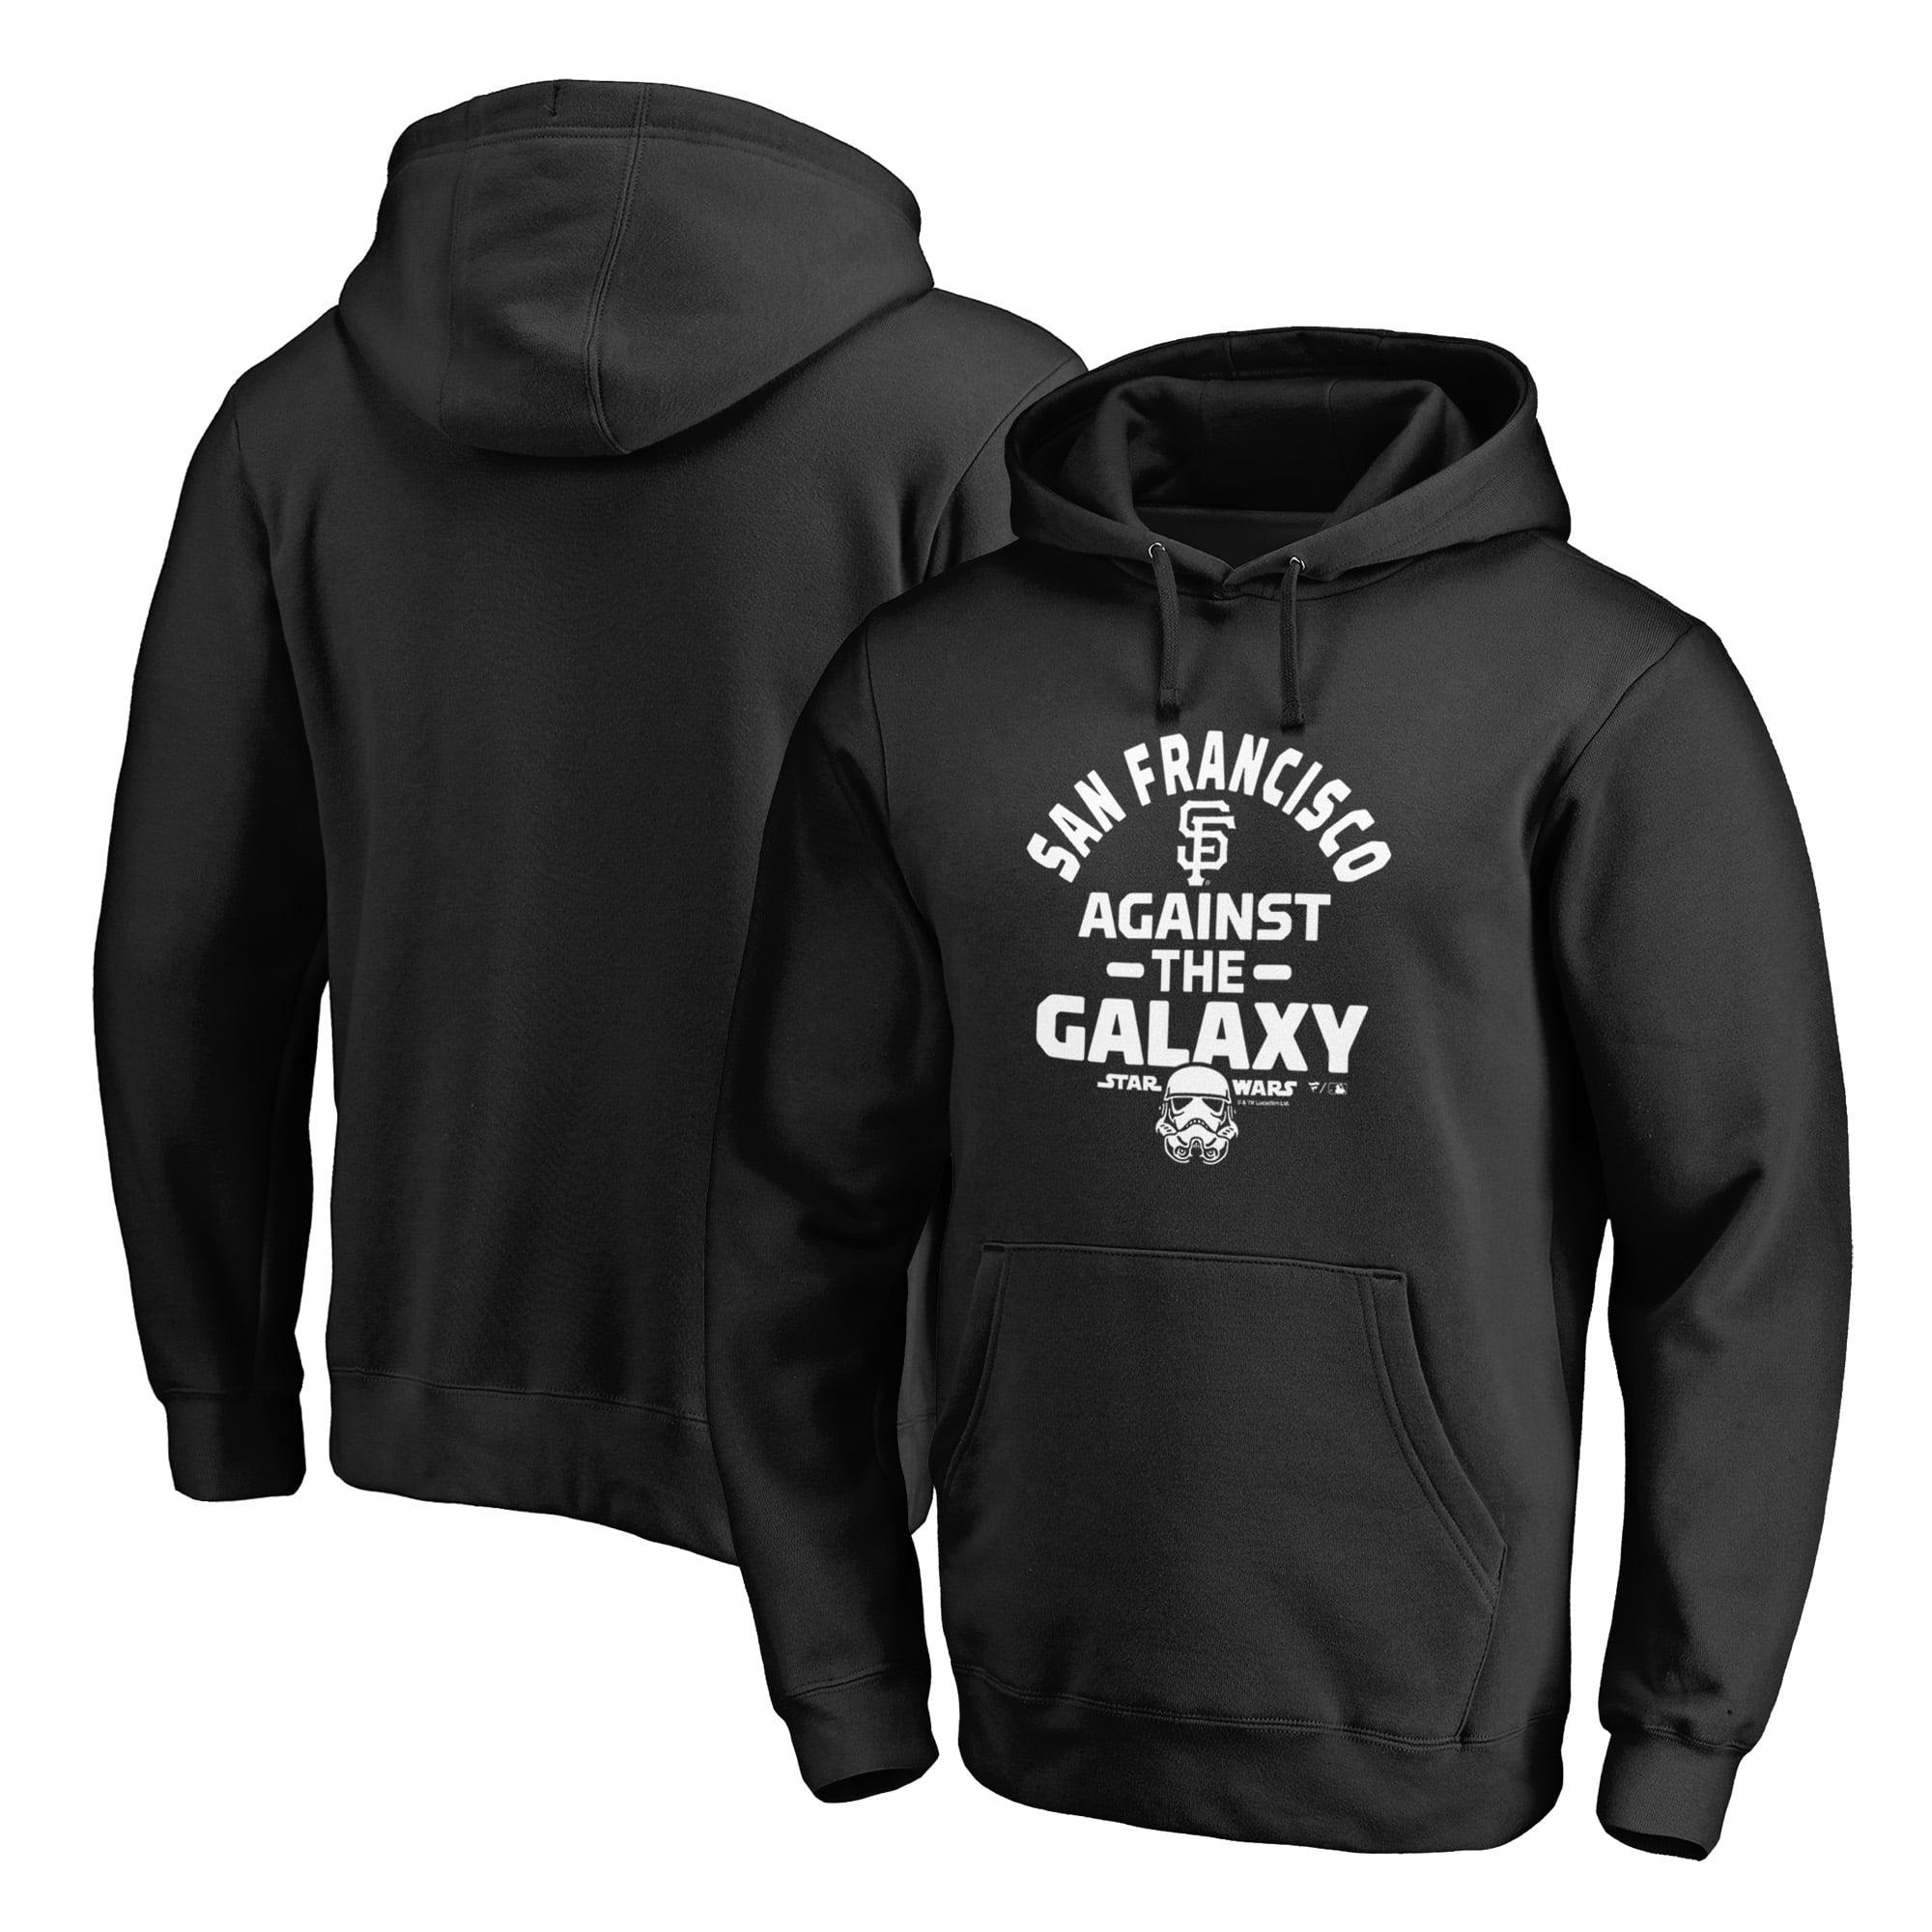 San Francisco Giants Fanatics Branded MLB Star Wars Against The Galaxy Pullover Hoodie - Black